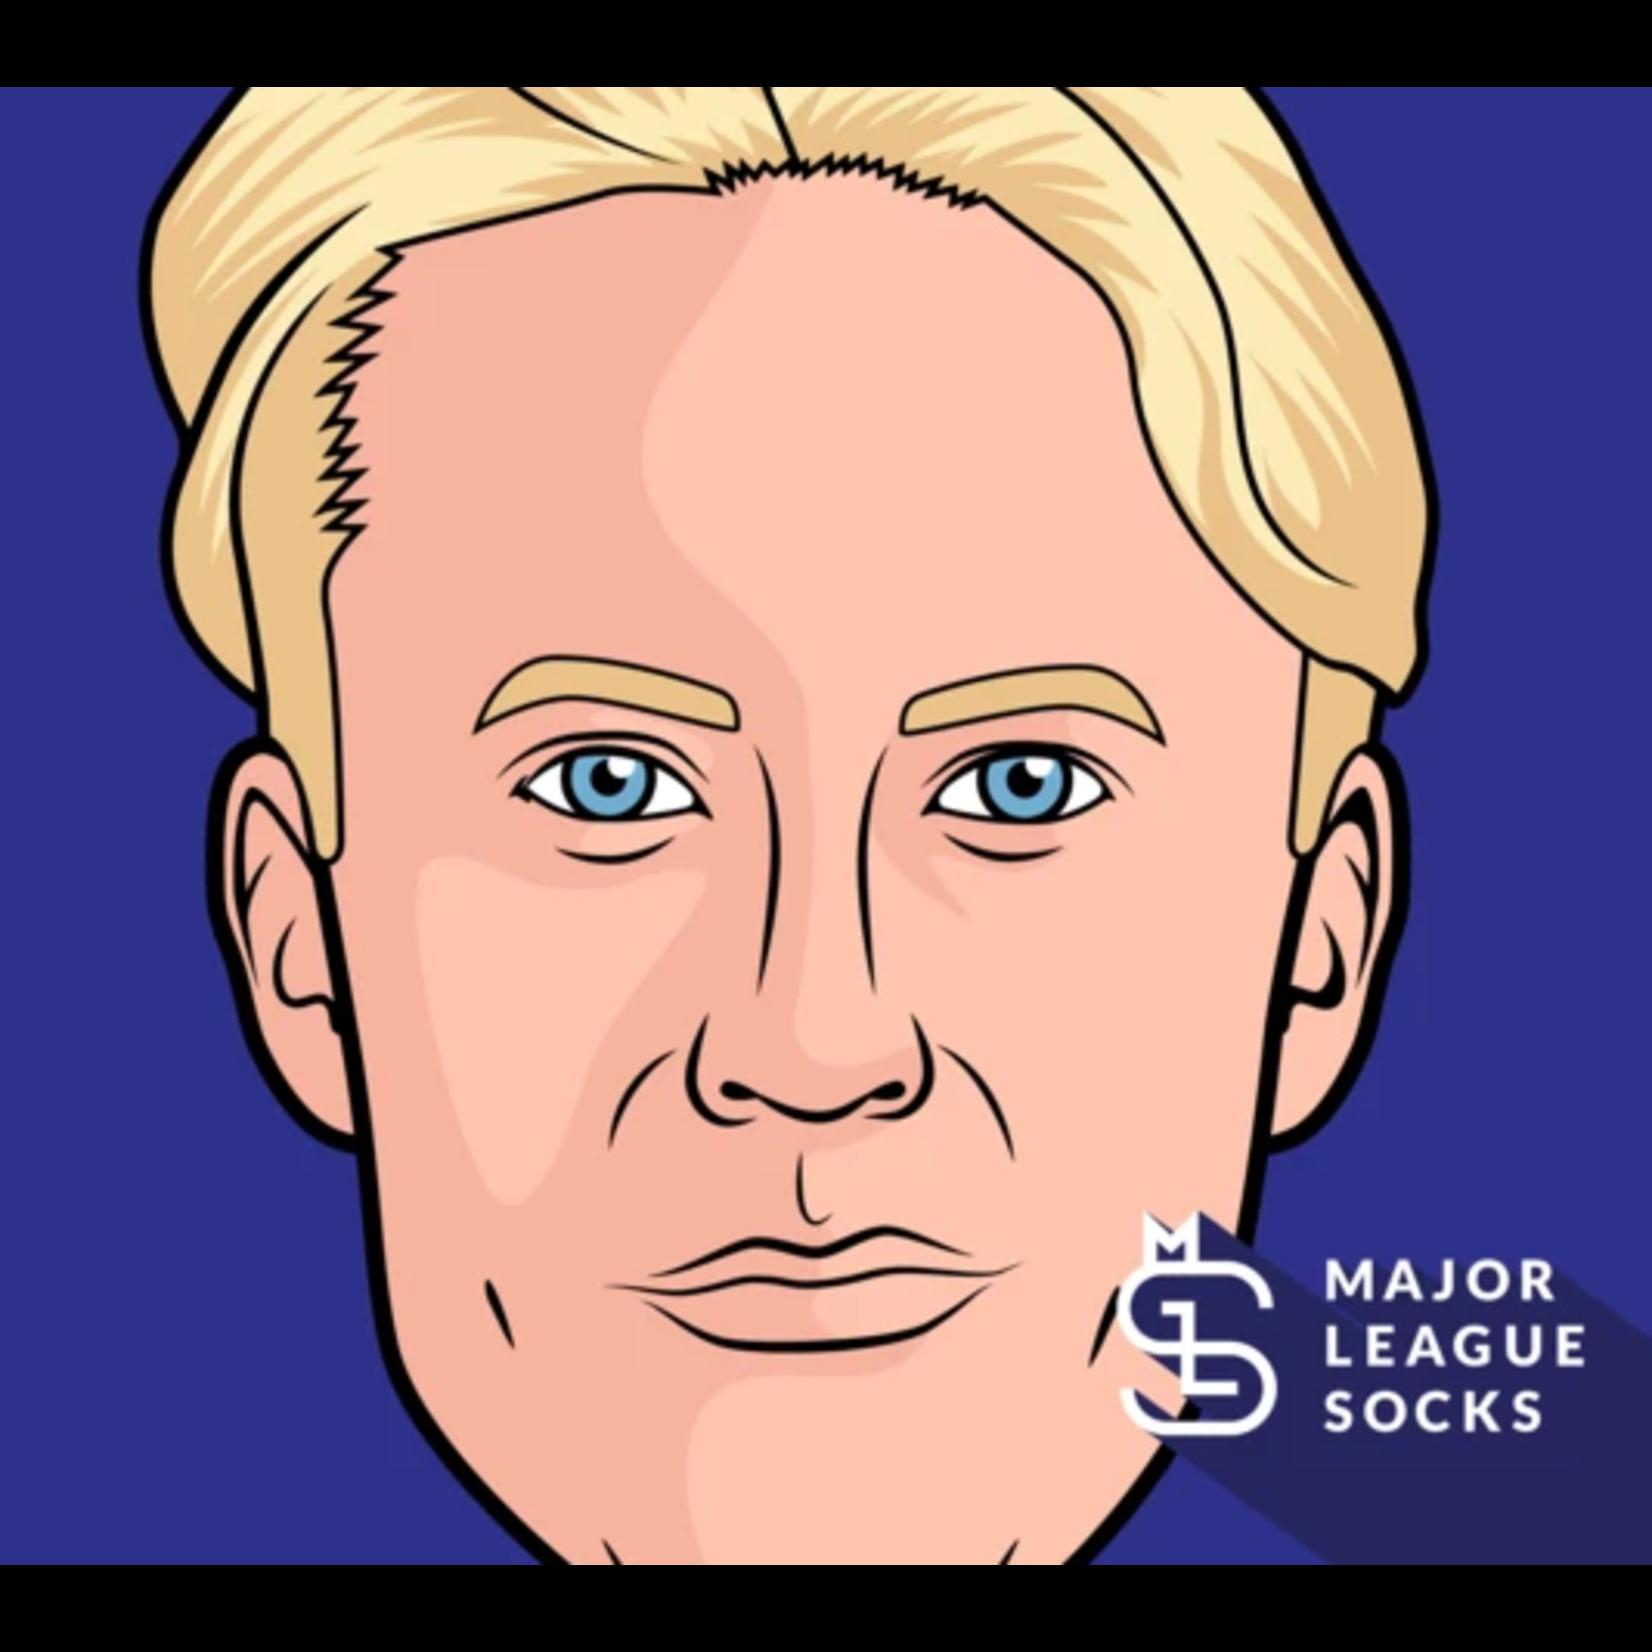 Major League Socks - Patrik Laine